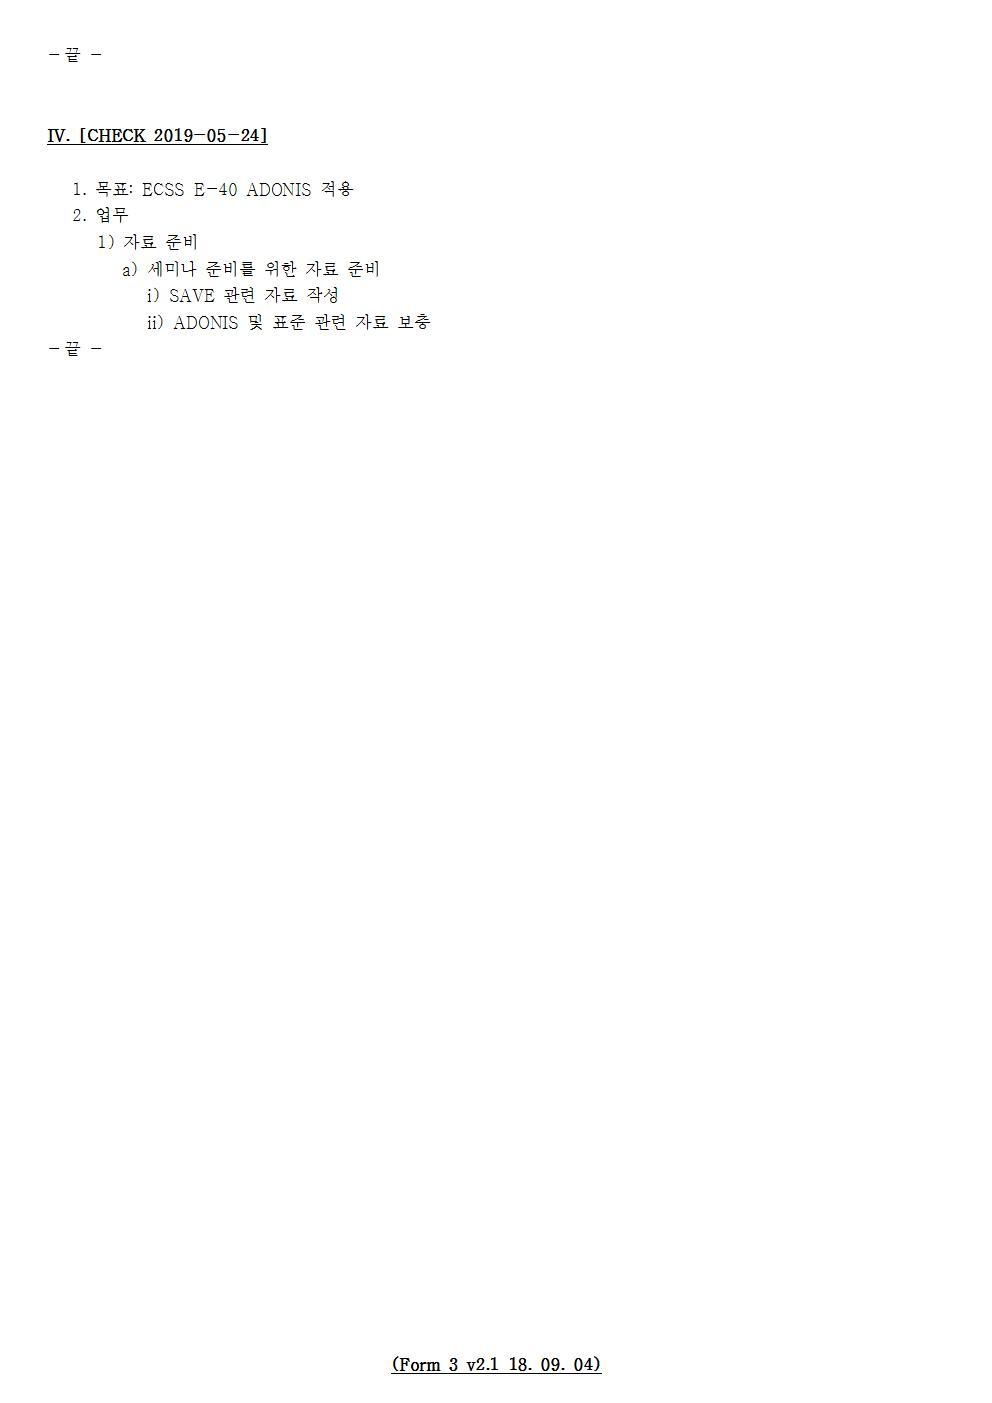 D-[19-004-RD-04]-[CMS]-[2019-05-24][YB]-[19-5-4]-[P+D+C]002.jpg